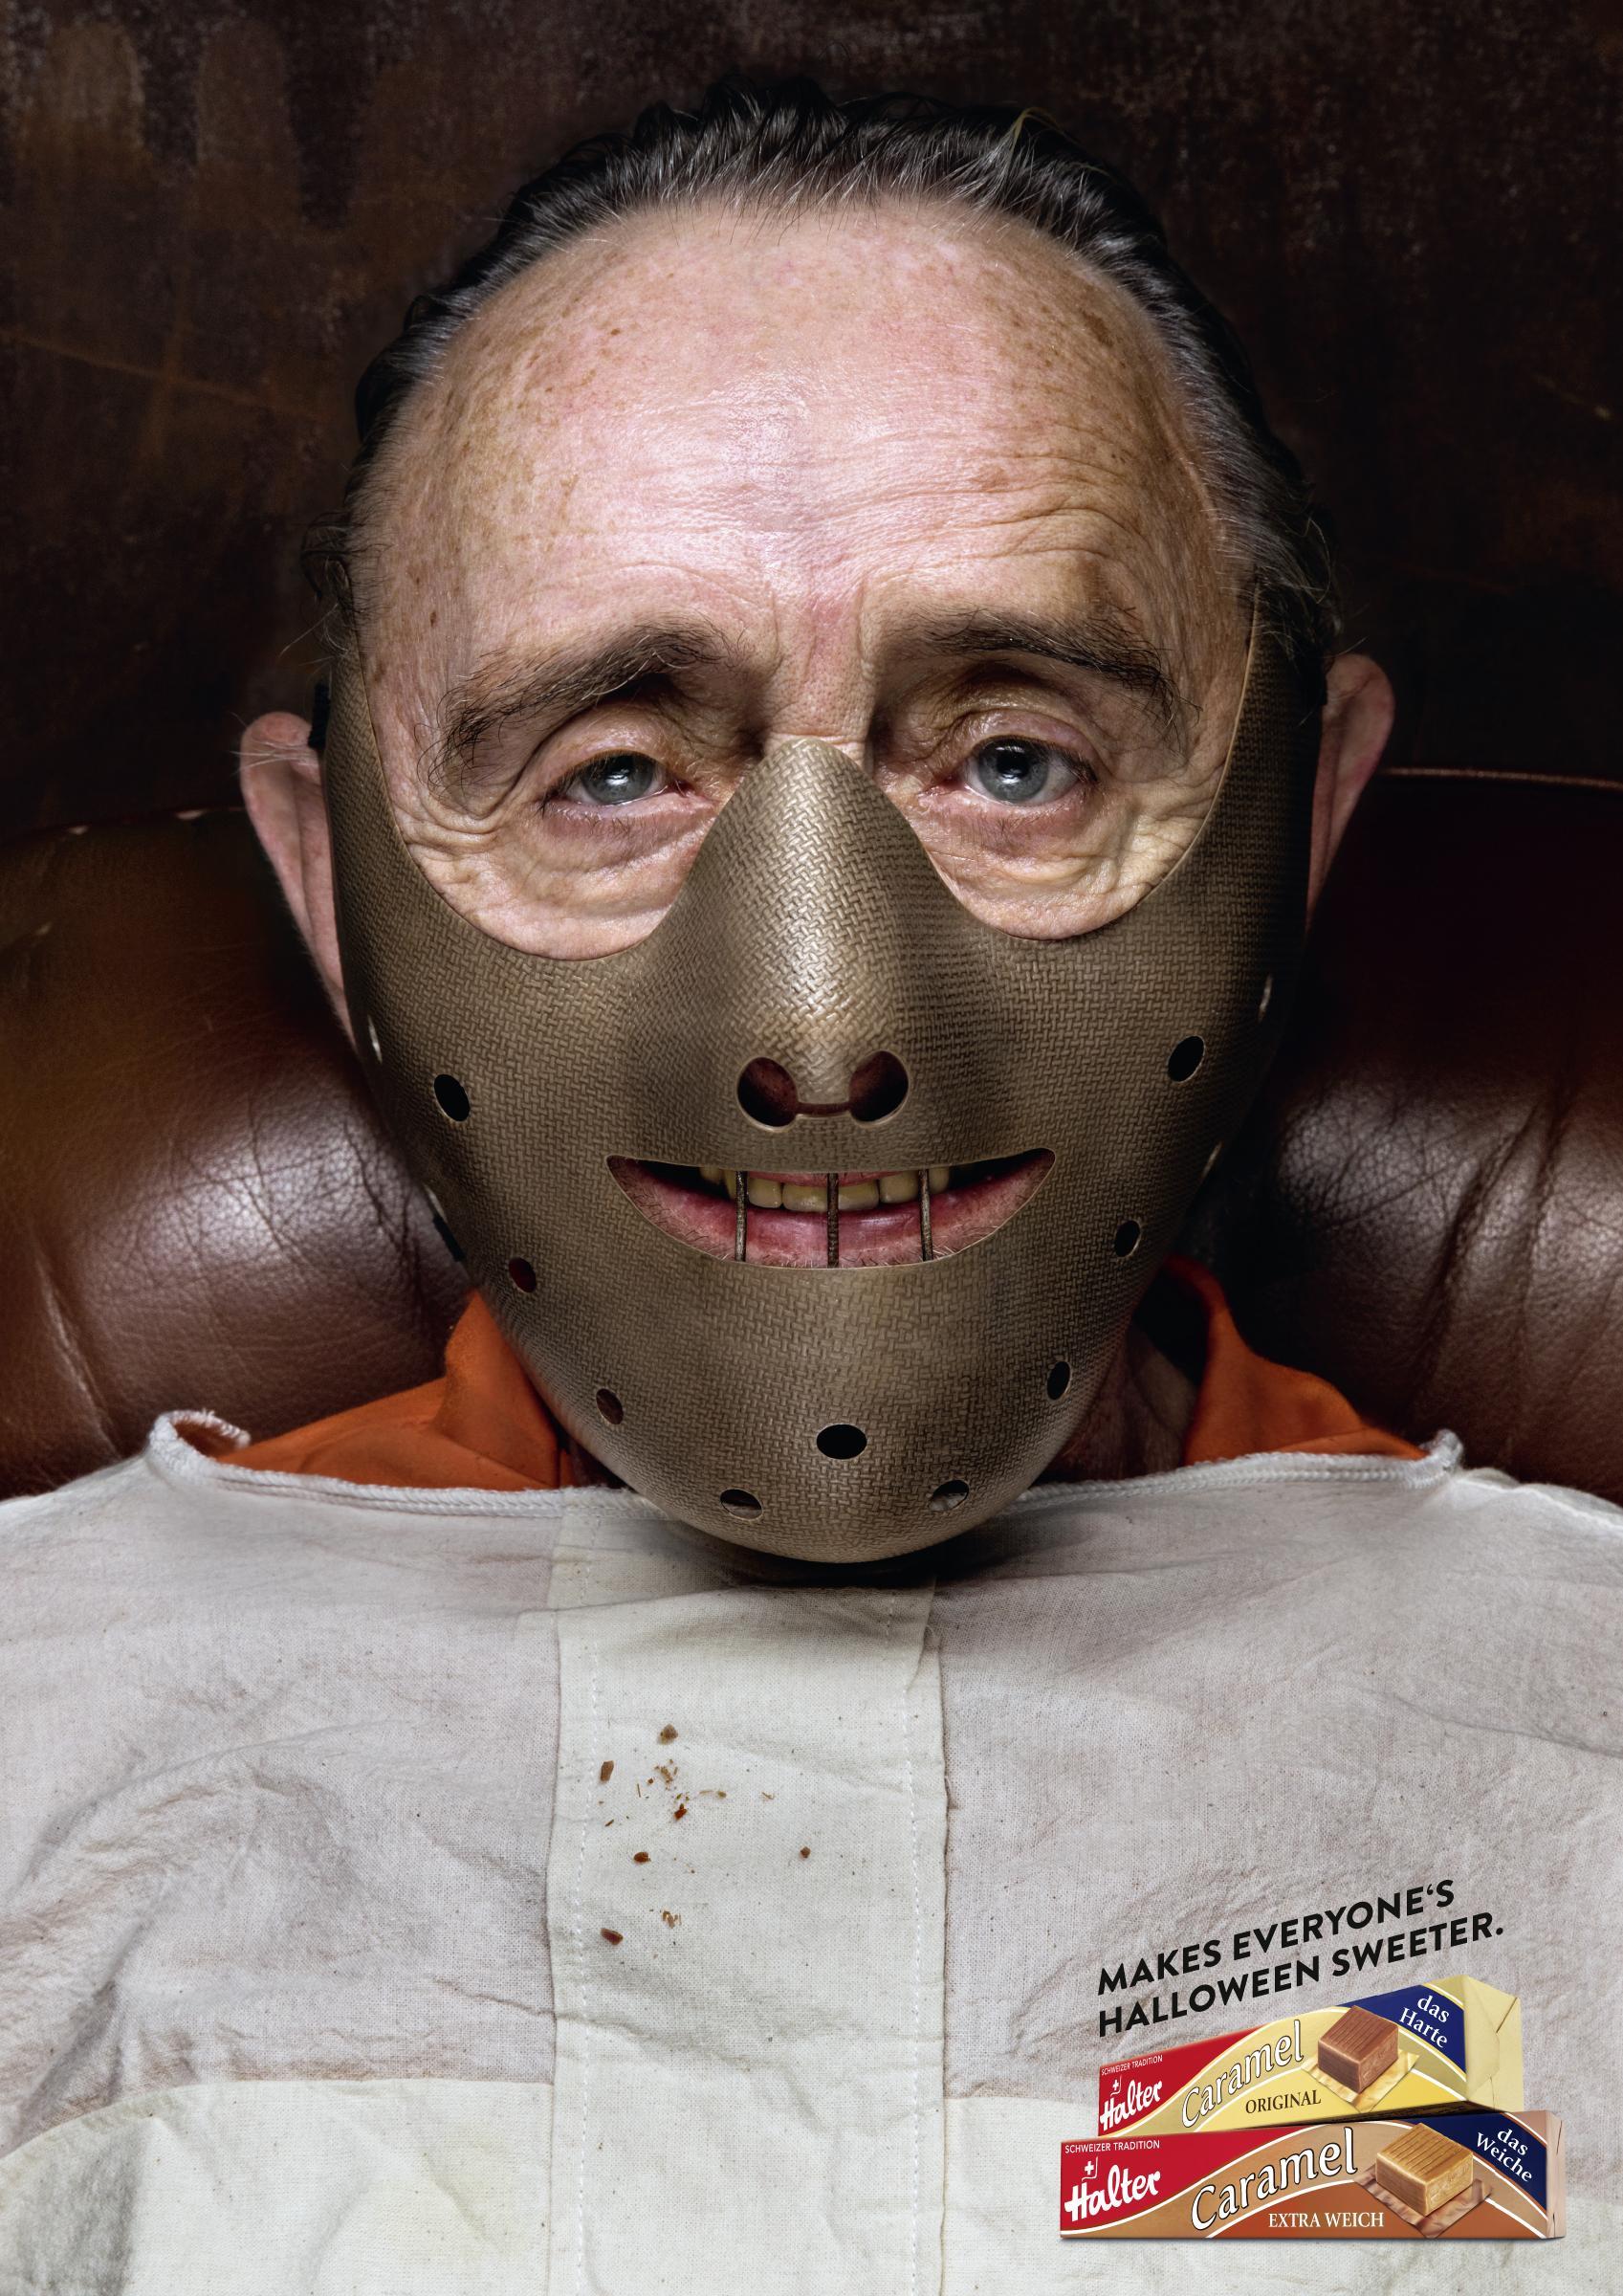 Halter Bonbons Print Ad - Halloween - Hannibal